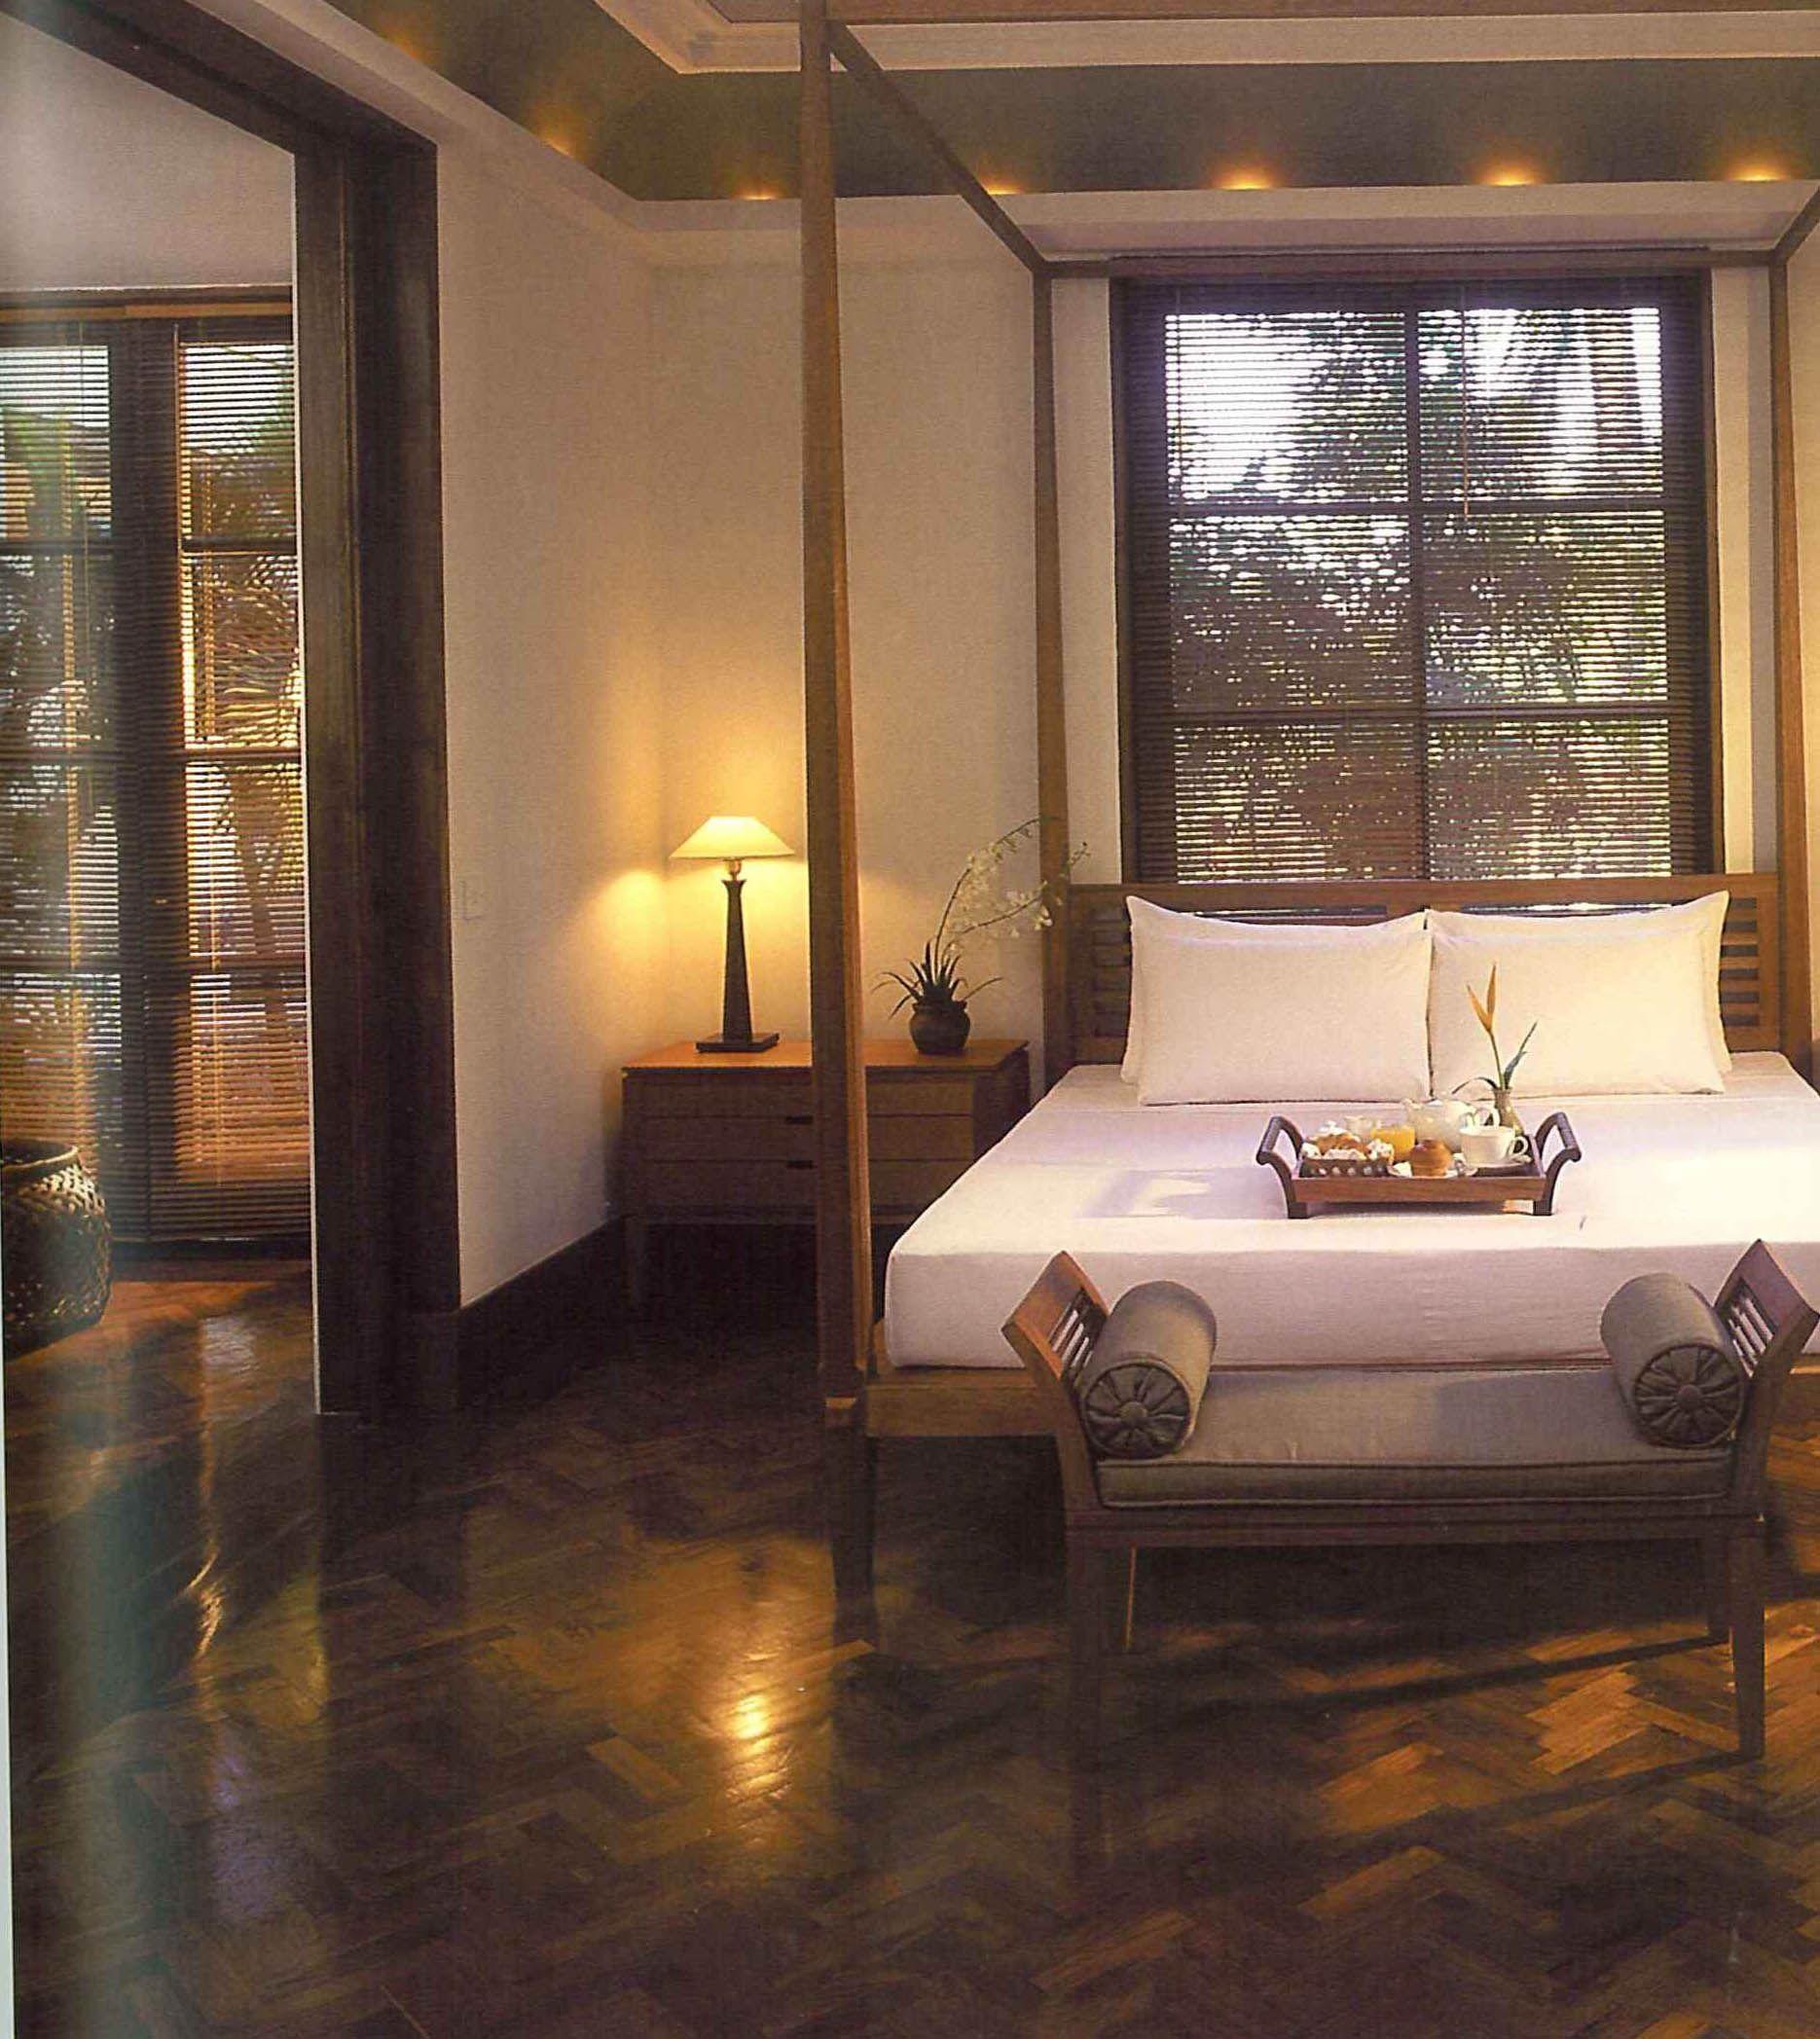 Executive Suite Executive suites, Interior design, Home